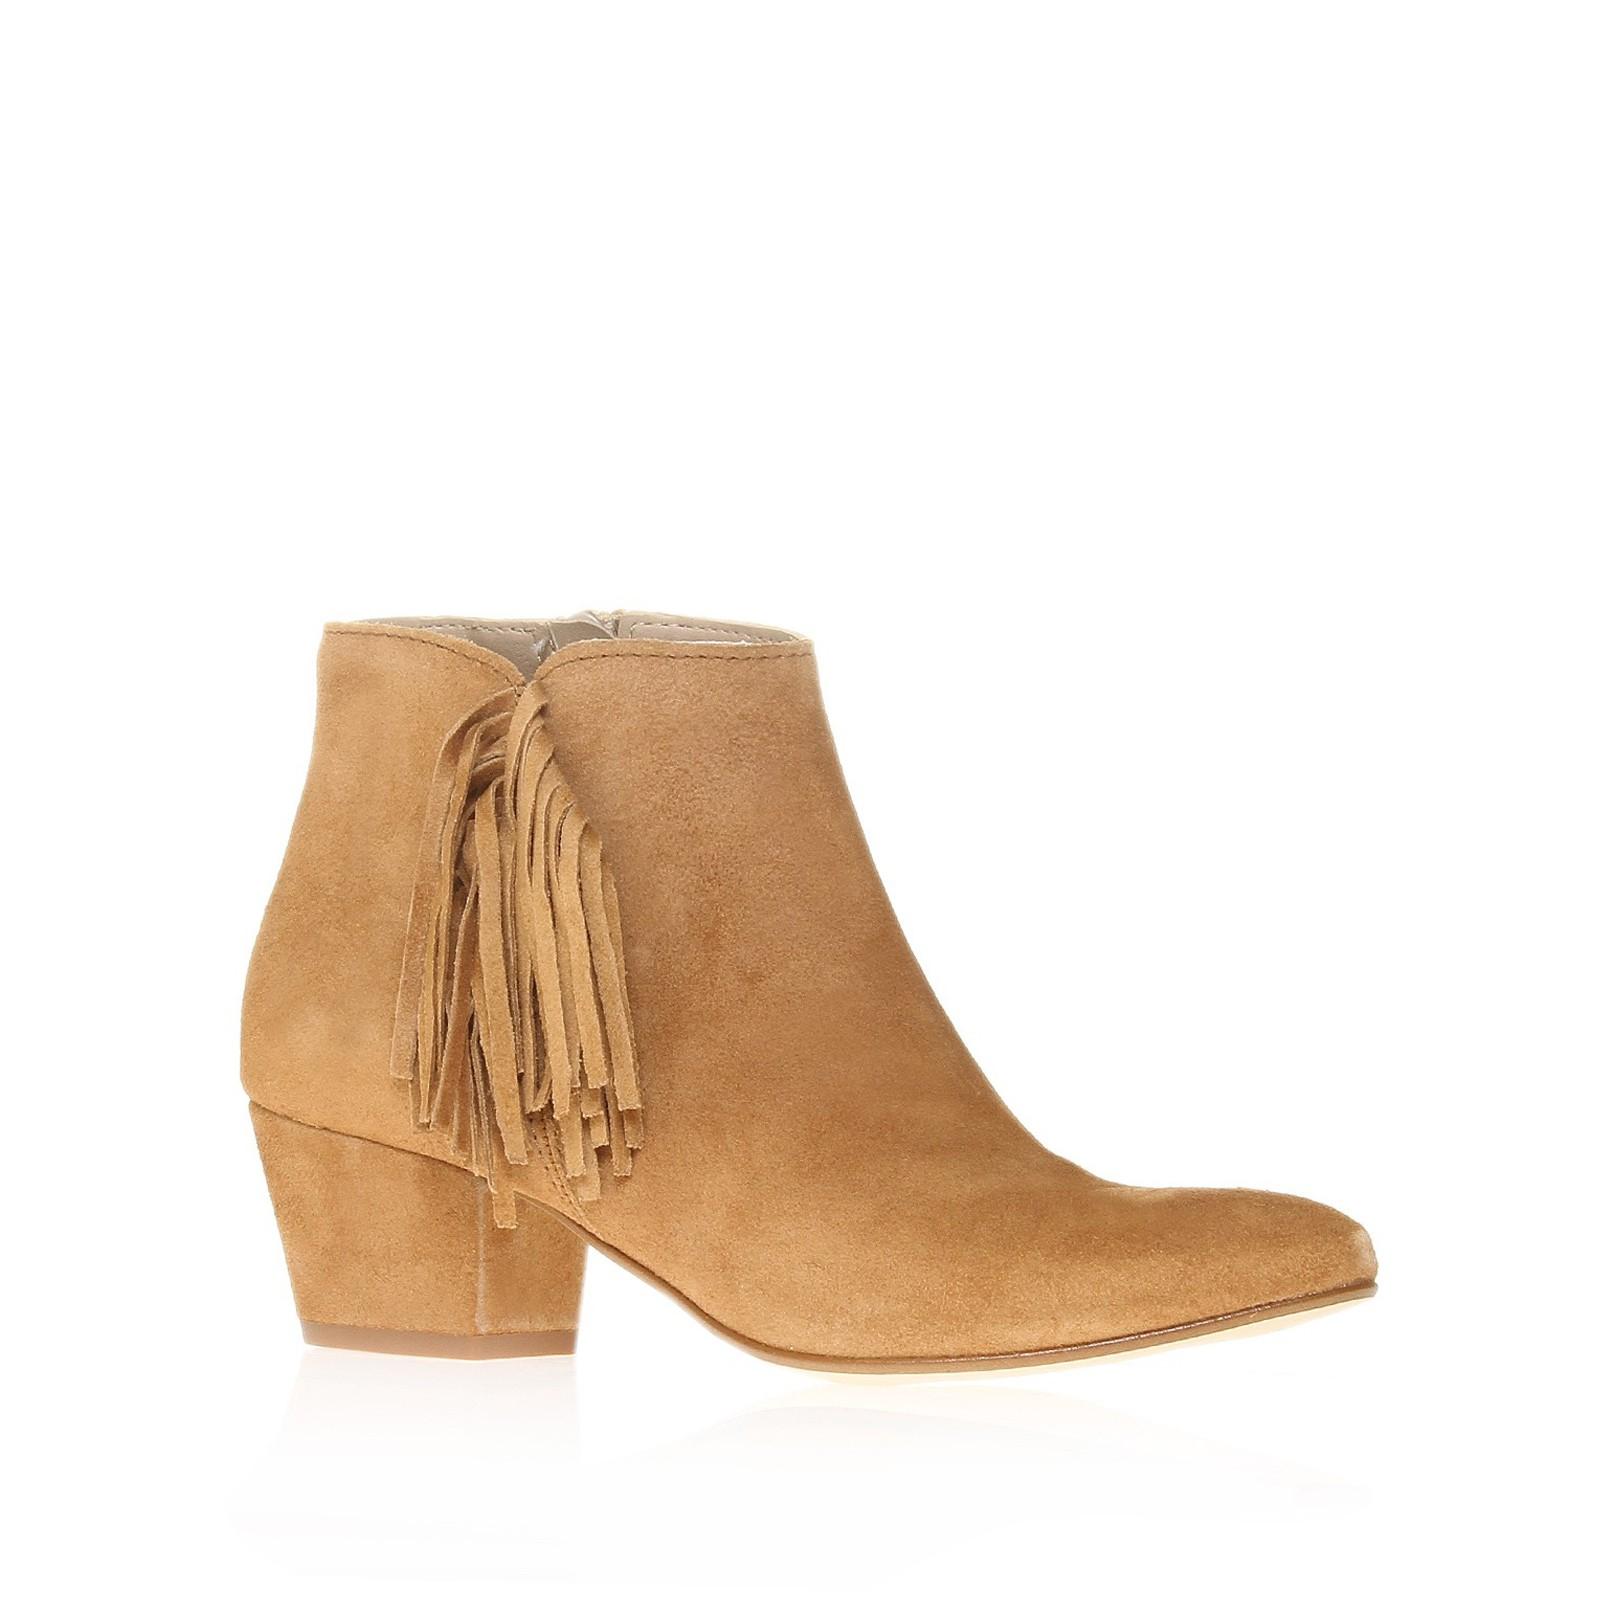 carvela kurt geiger ankle boots in brown lyst